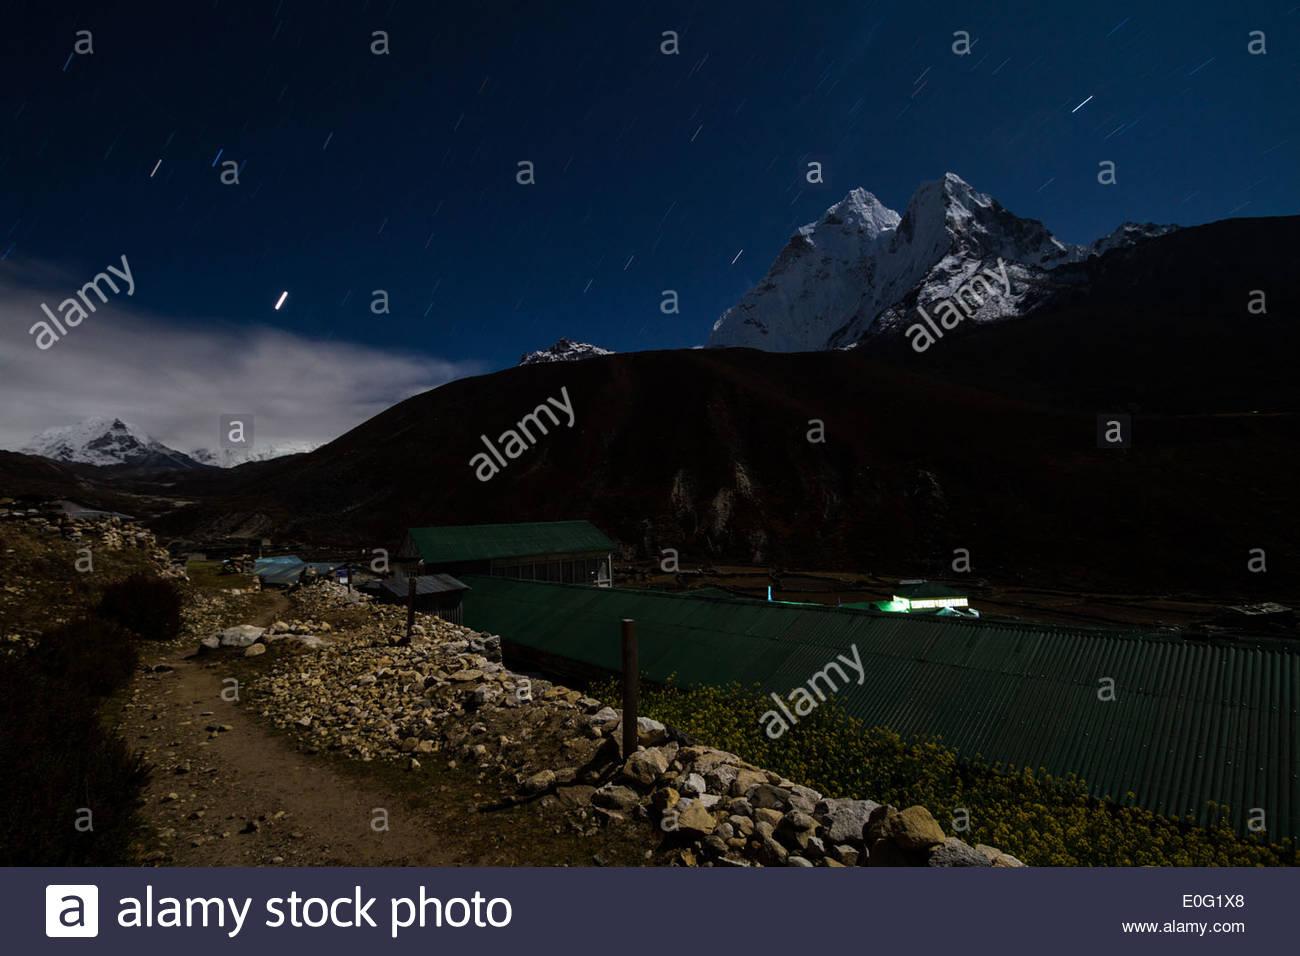 Star trails over Ama Dablam, Himalayas, Nepal - Stock Image